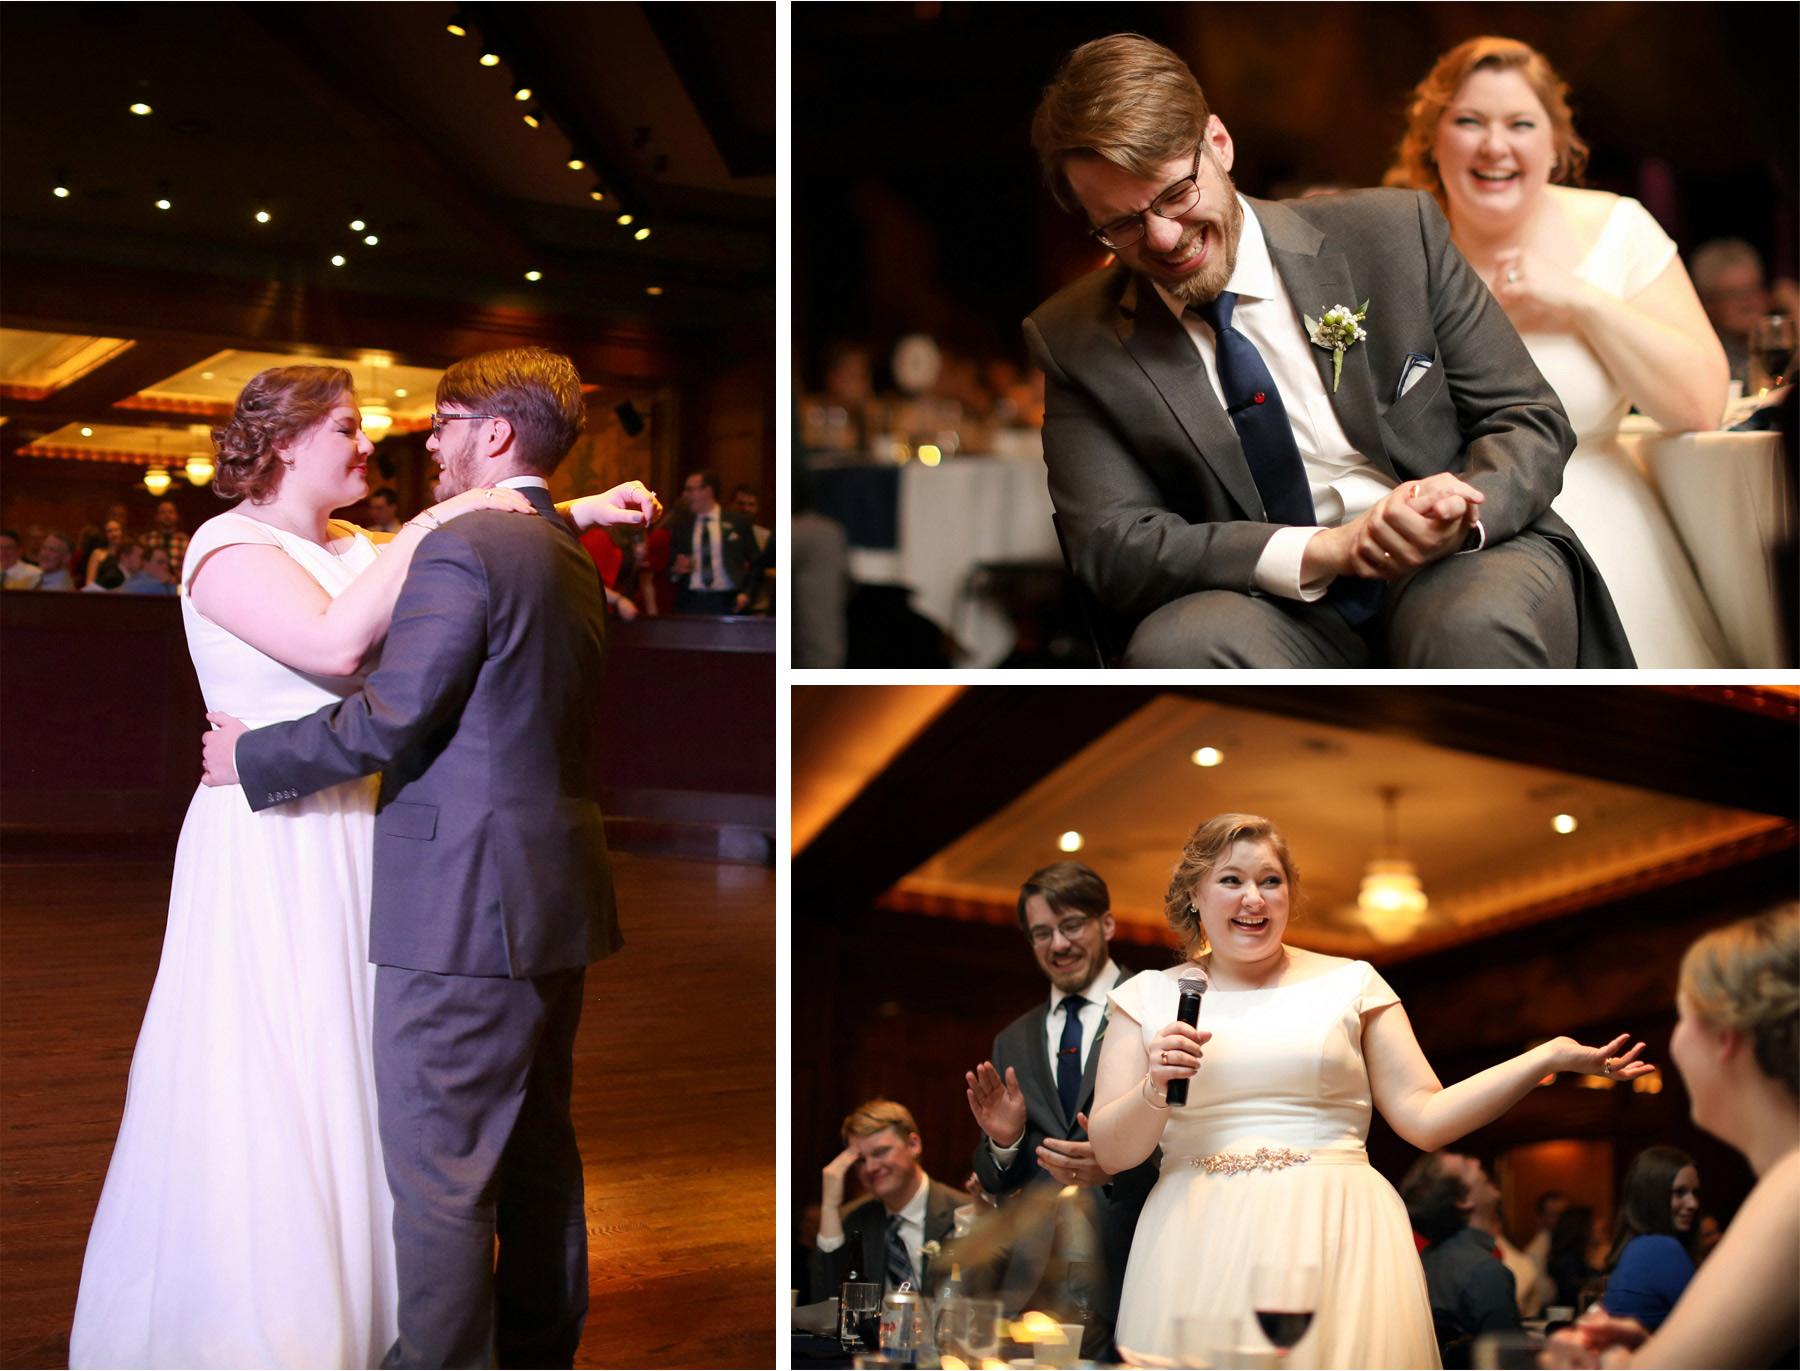 16-Minneapolis-Wedding-Photography-by-Vick-Photography-Reception-Metropolitan-Ballroom-Dance-Libby-and-Nathan.jpg